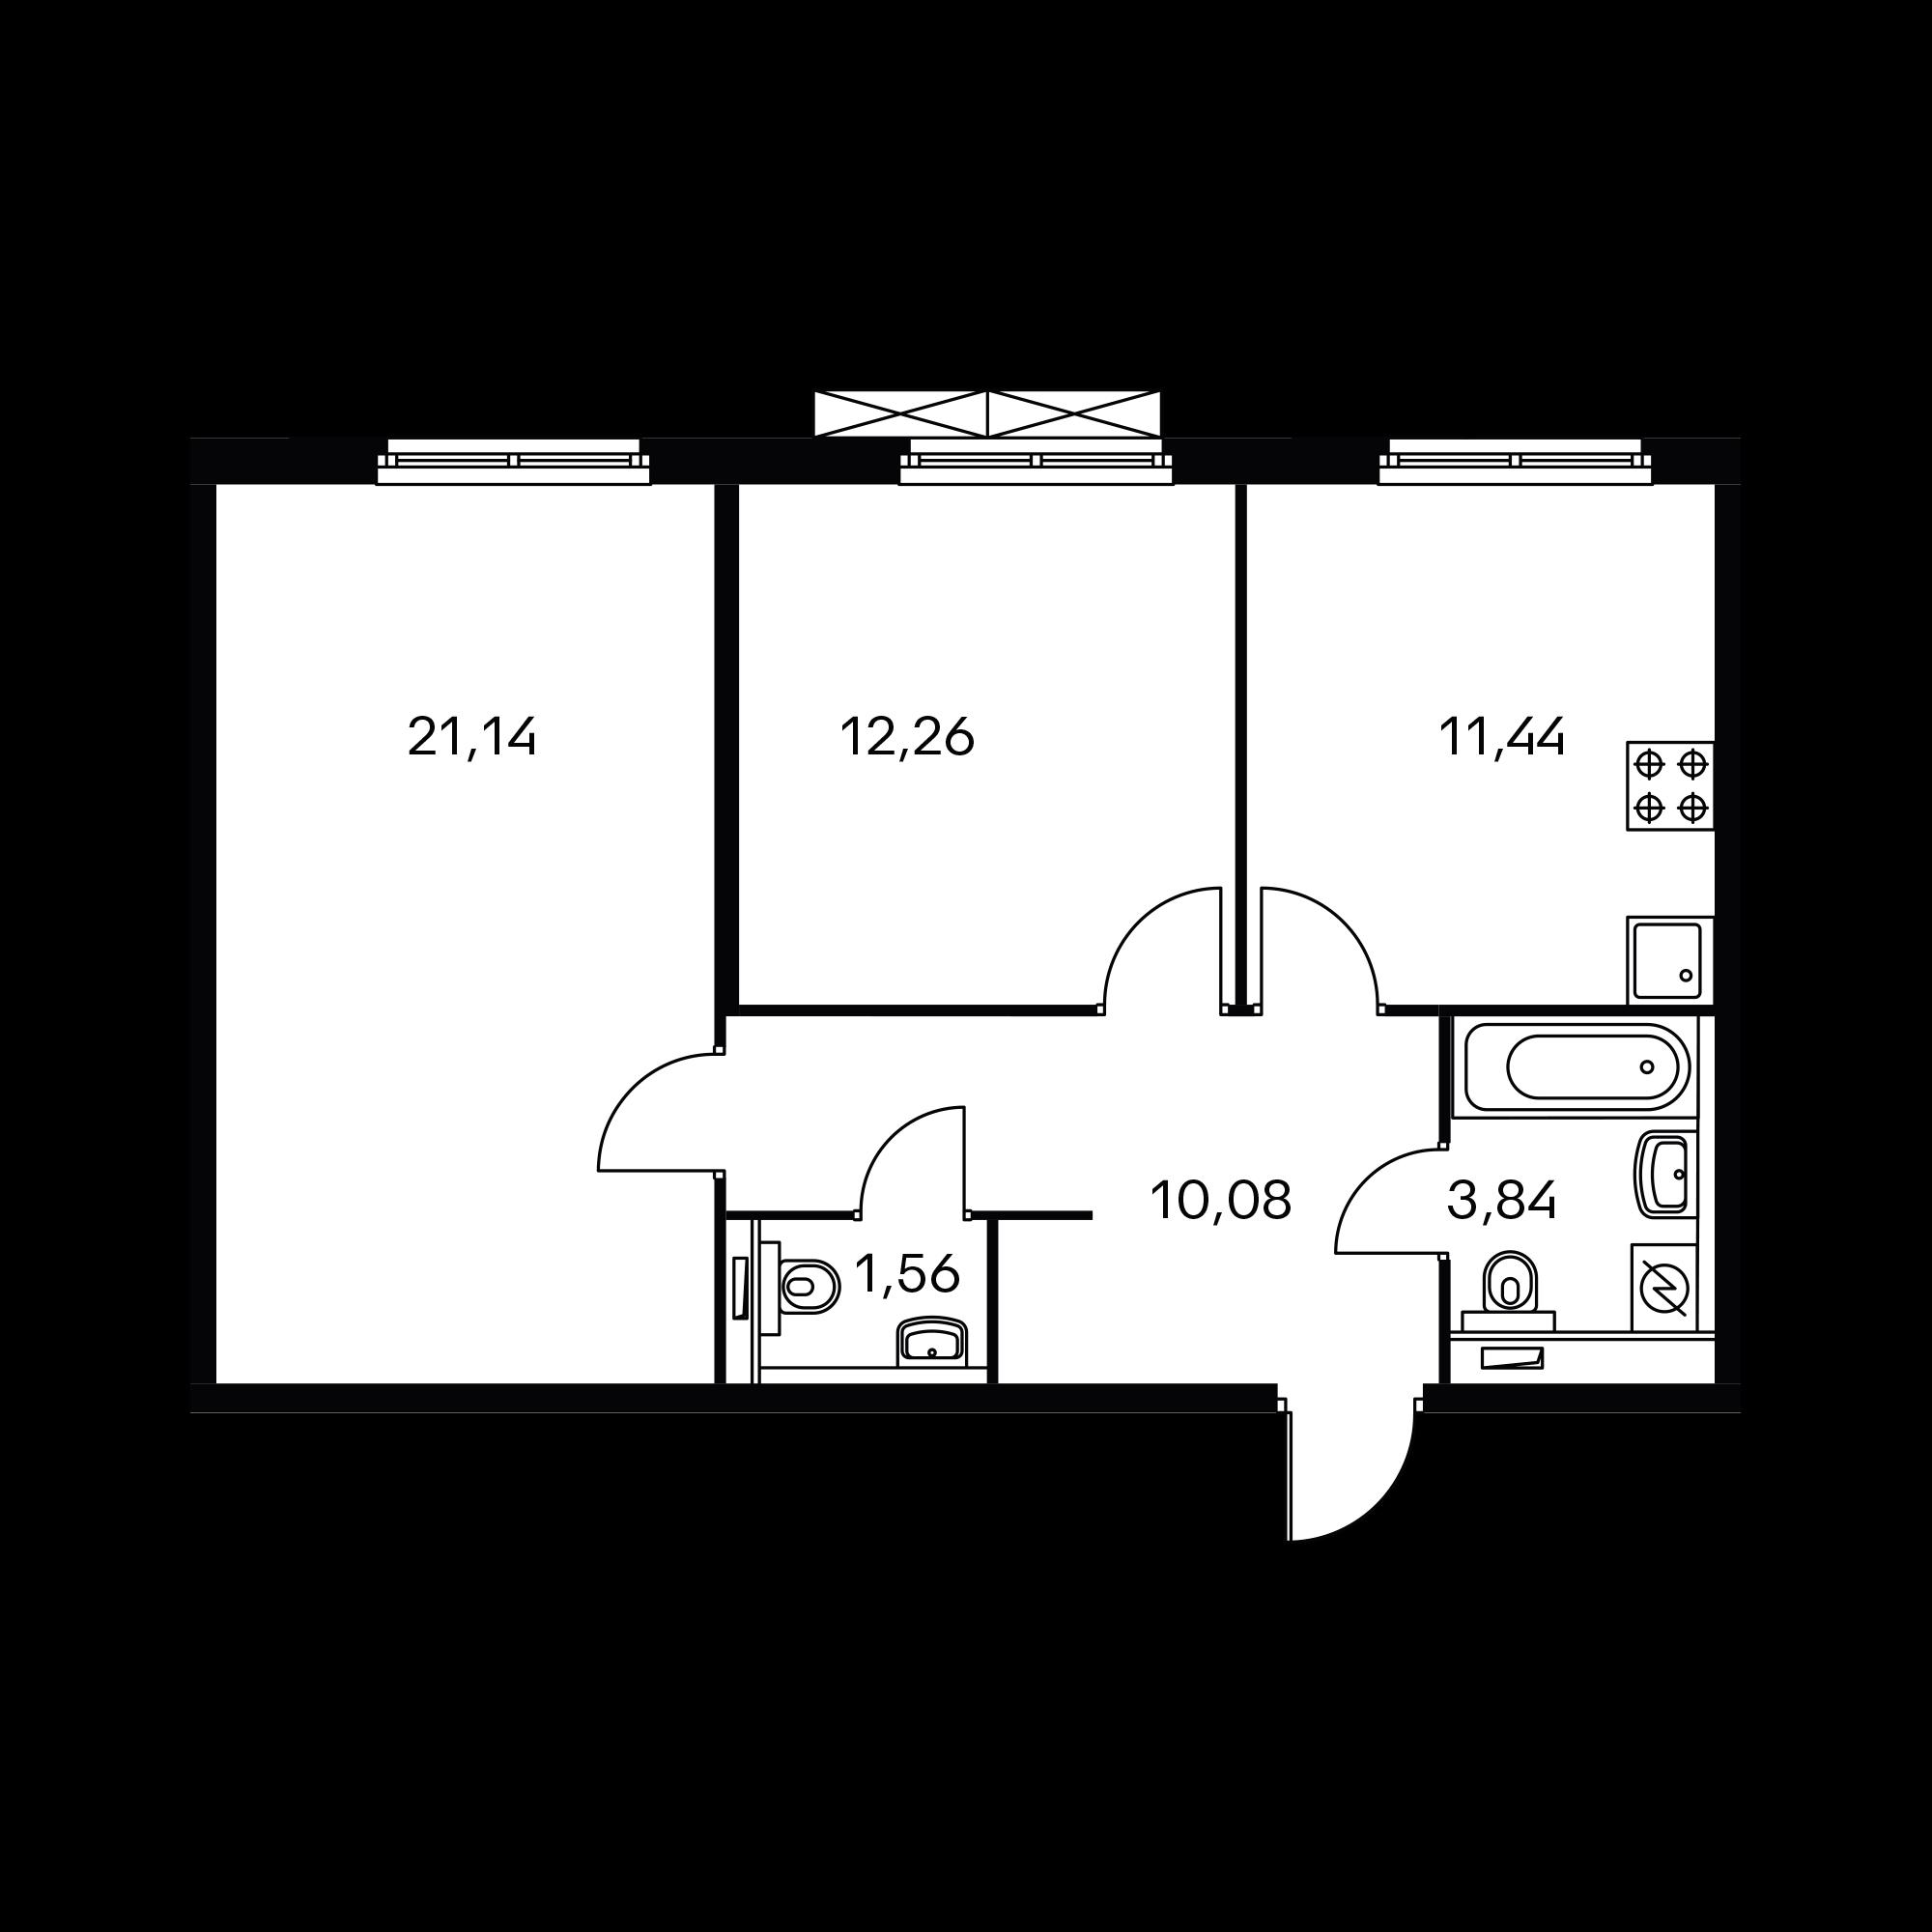 2KM6_10.5-1_S_Z3